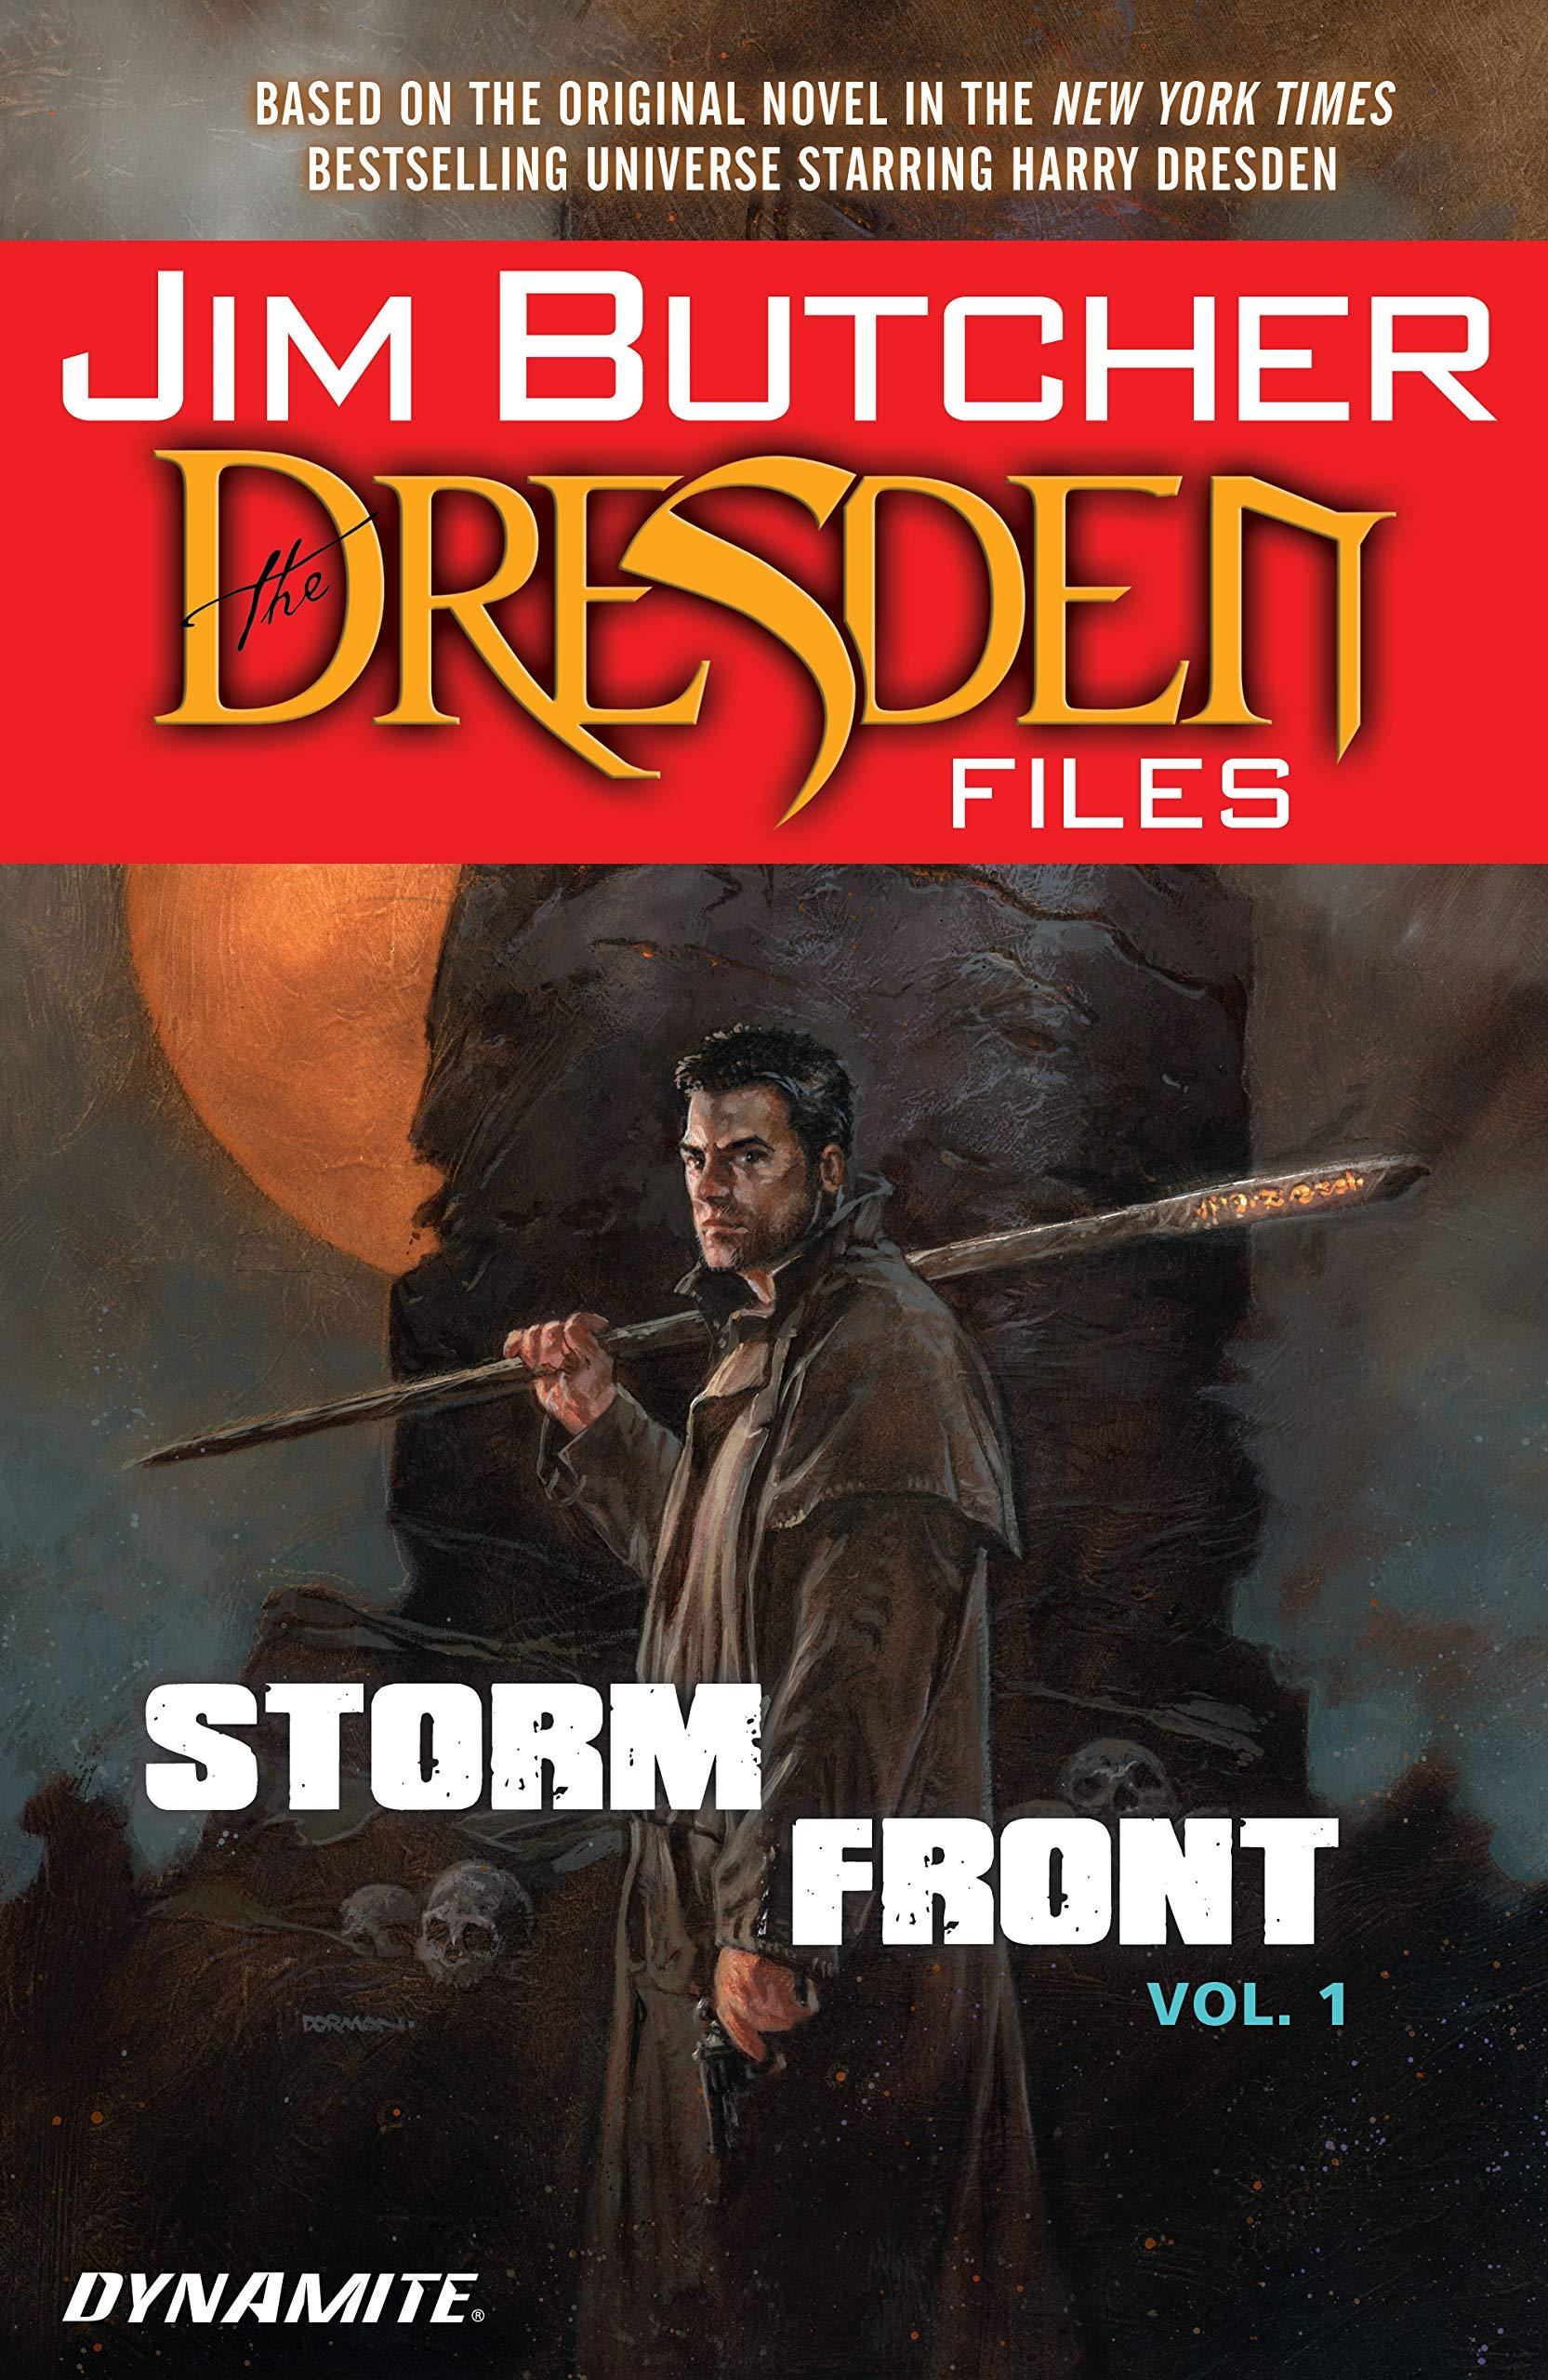 Jim Butcher's The Dresden Files Vol. 1: Storm Front